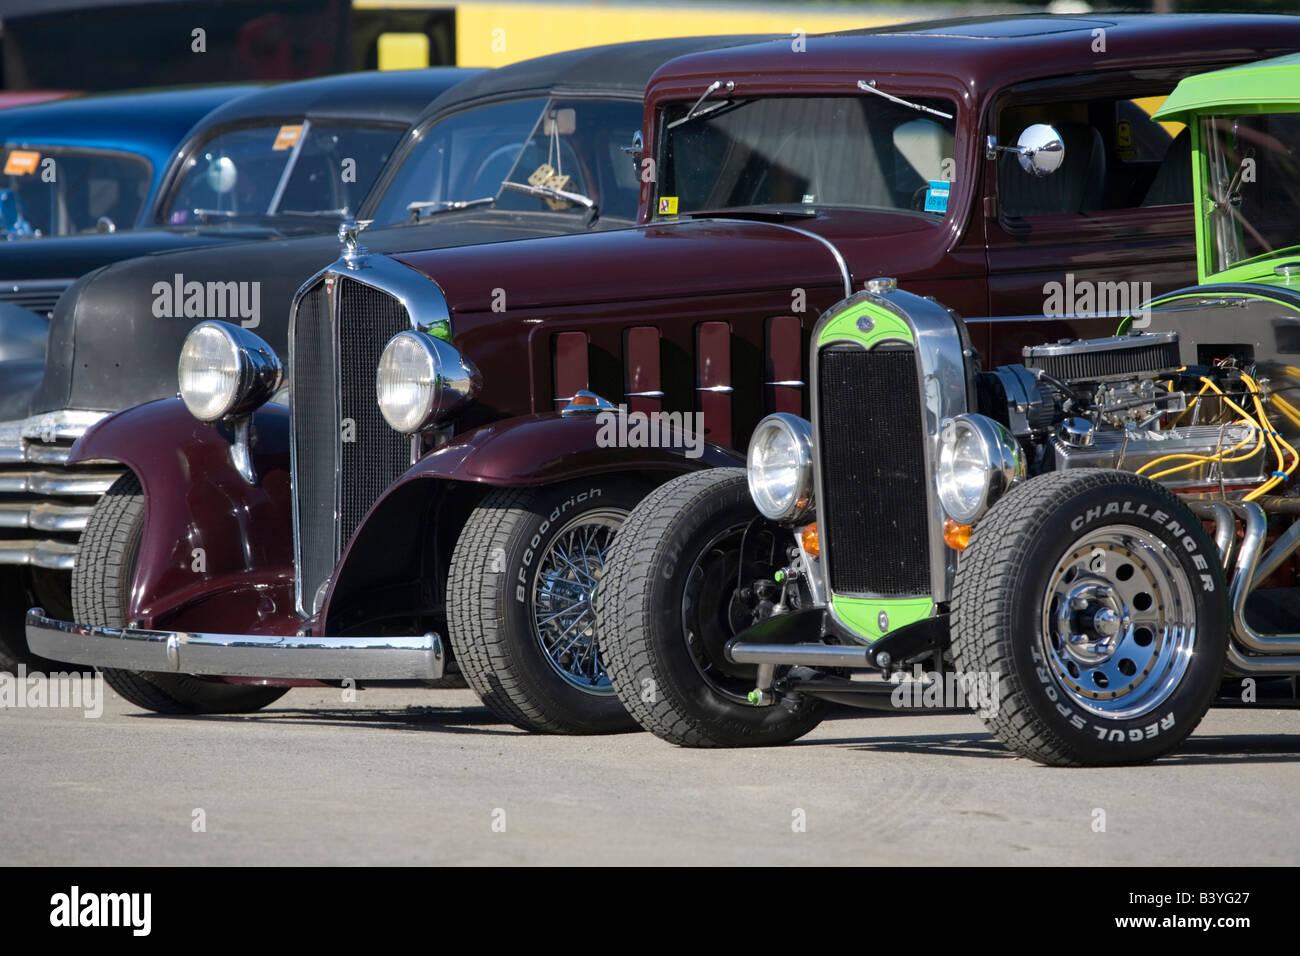 Saab Dealership Near Me >> Atlantic Motor Cars Plainfield Nh - impremedia.net